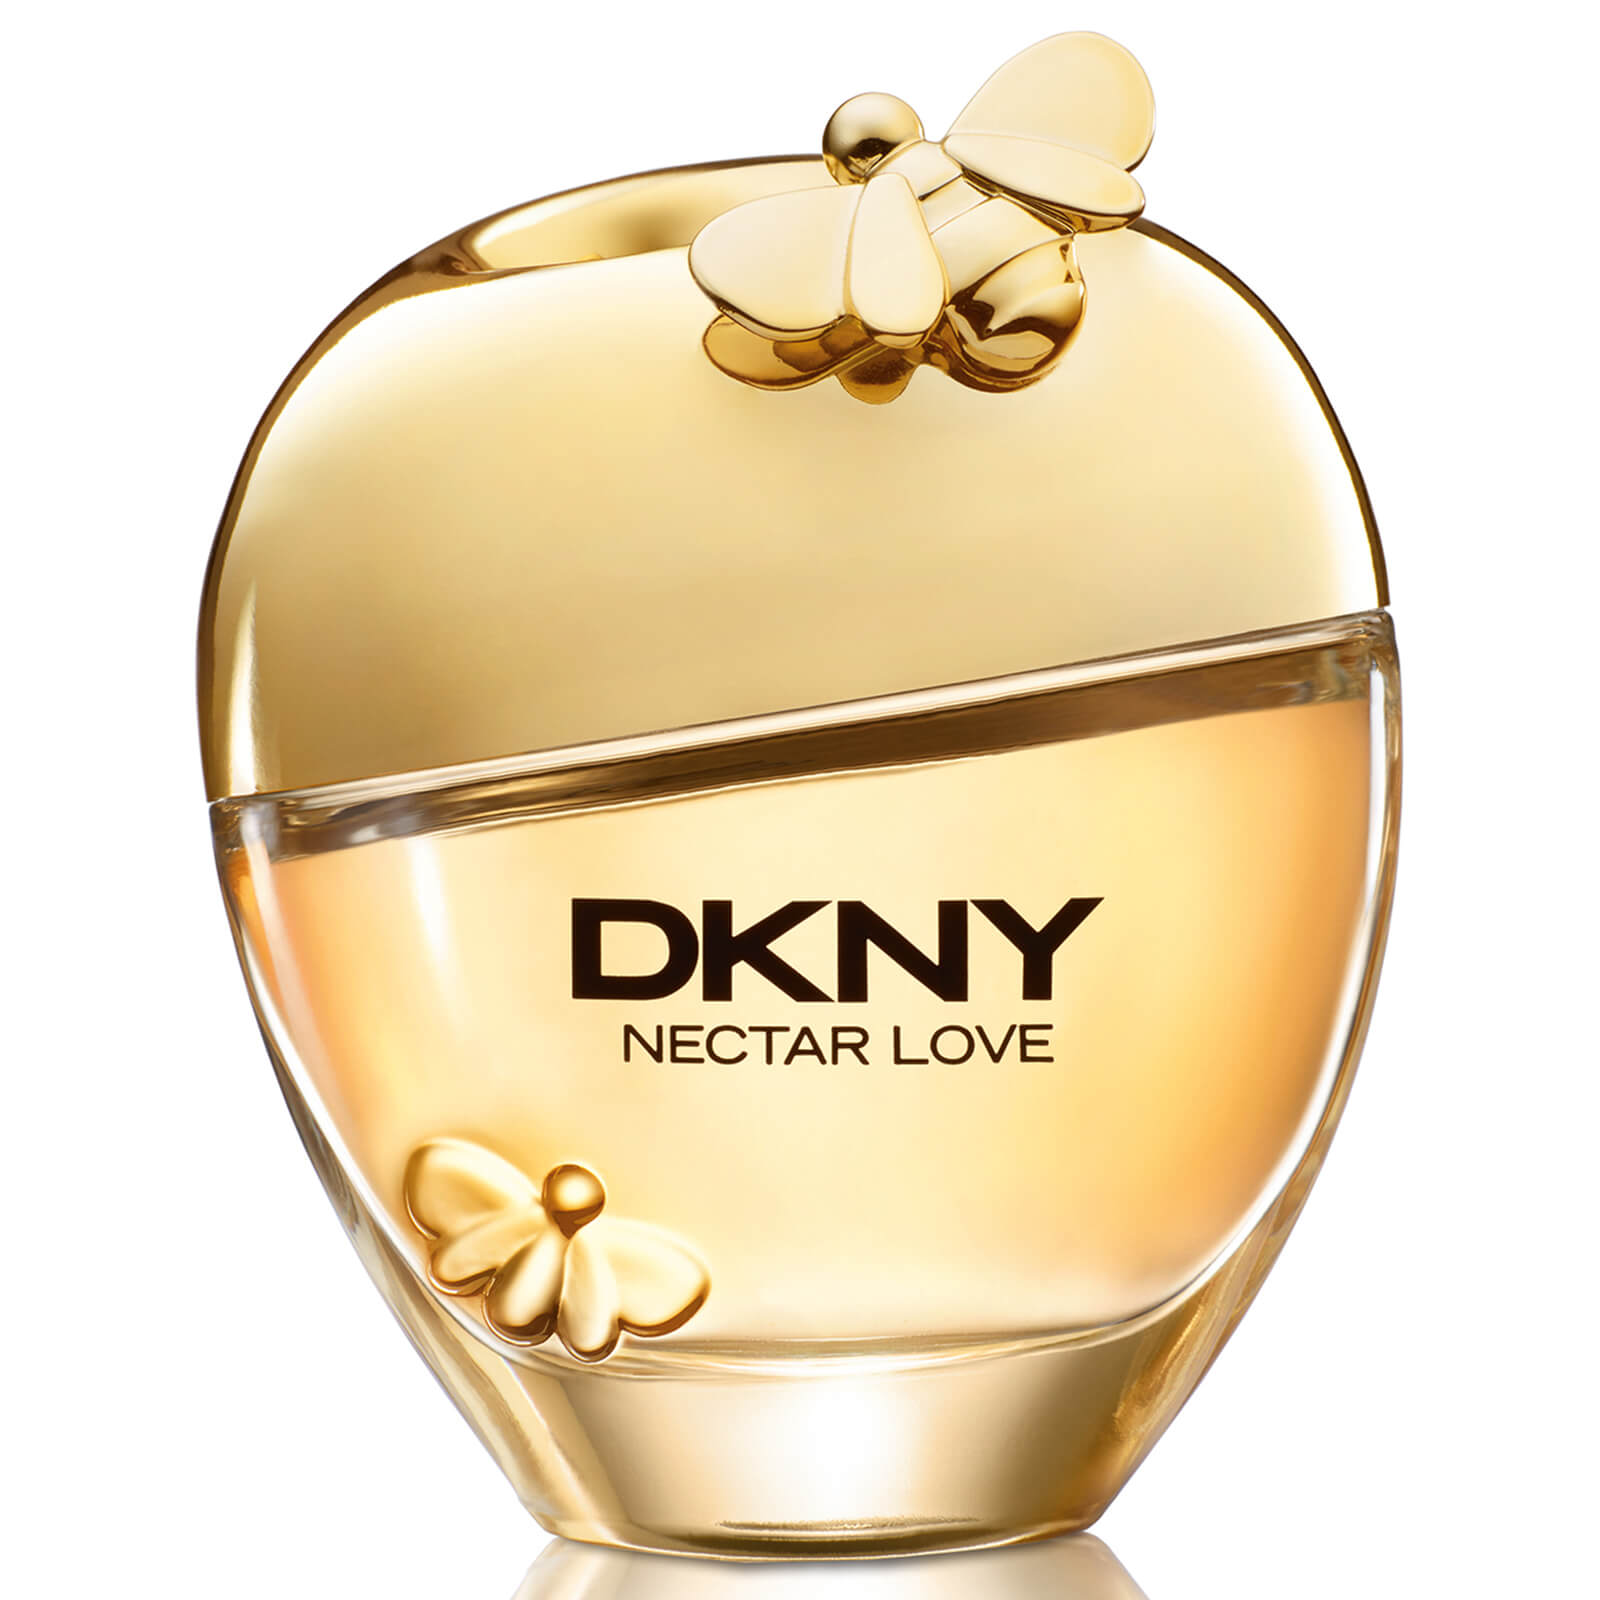 Dkny Nectar Love Eau De Parfum 50ml Free Shipping Lookfantastic